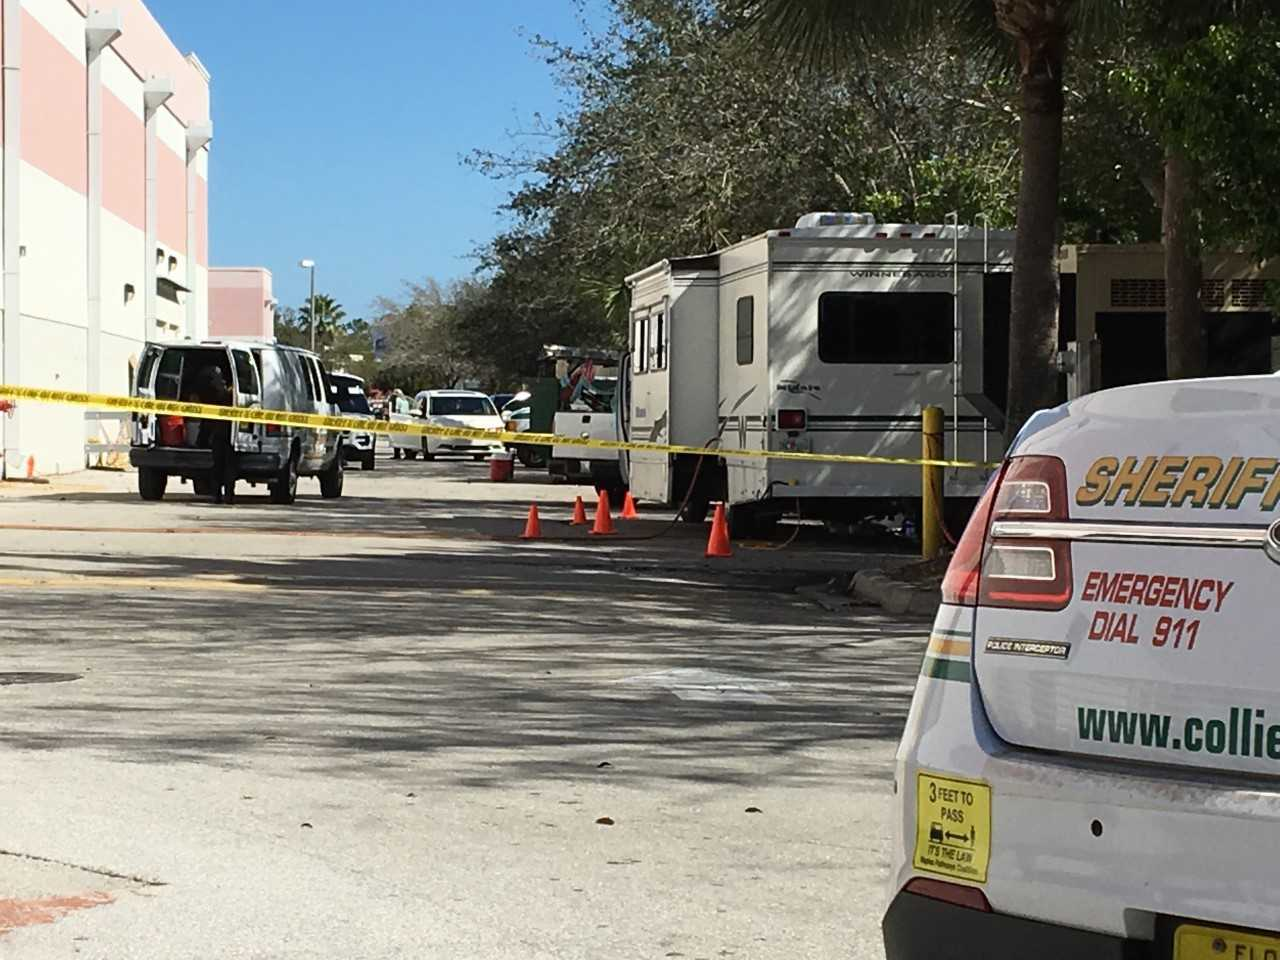 Witness describes man's murder in Naples RV